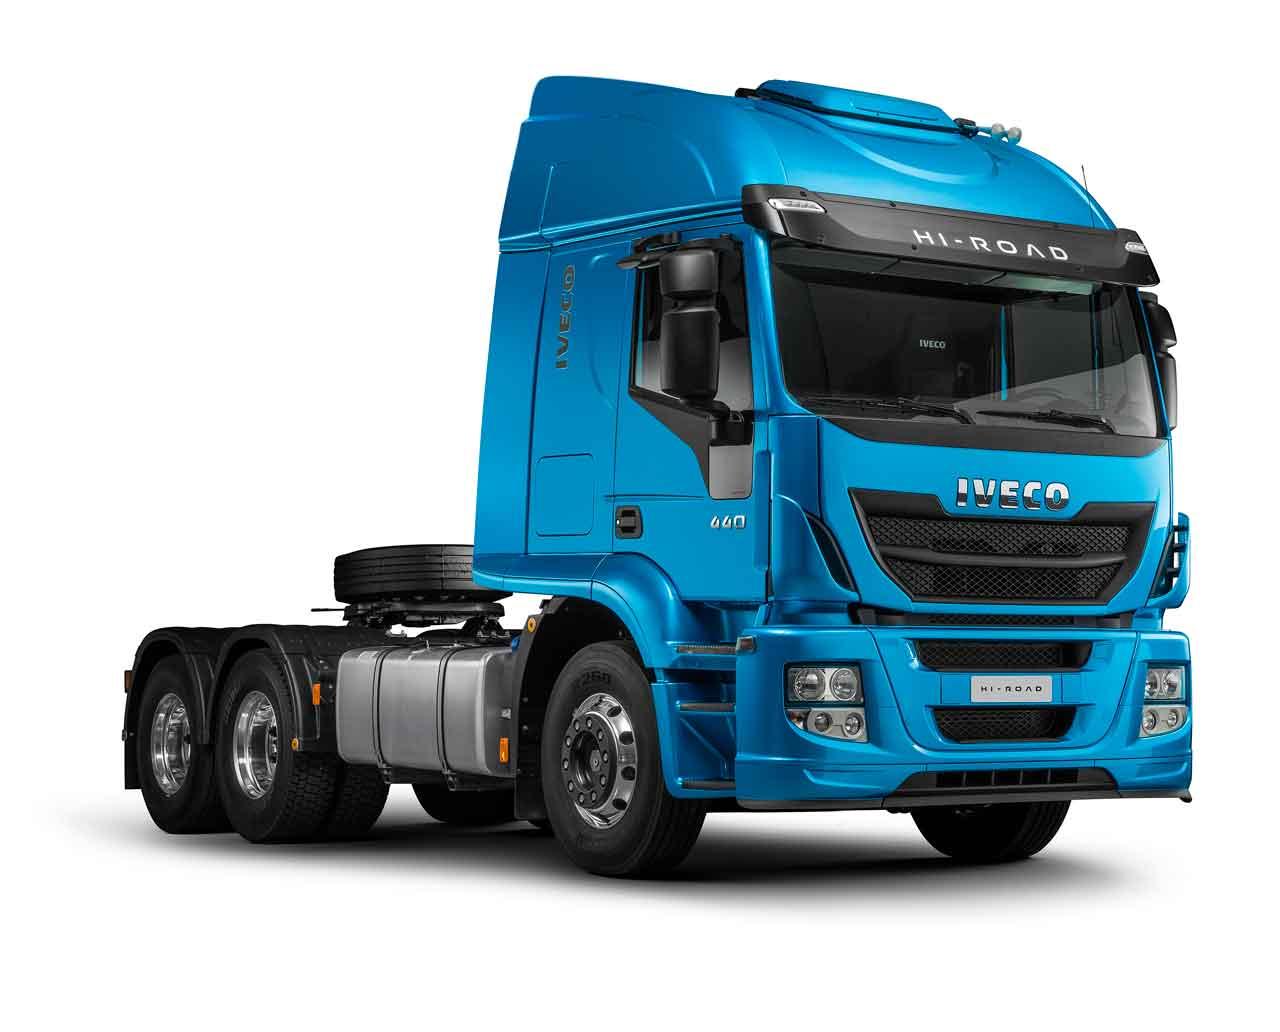 Caminhão Iveco Hi-Road